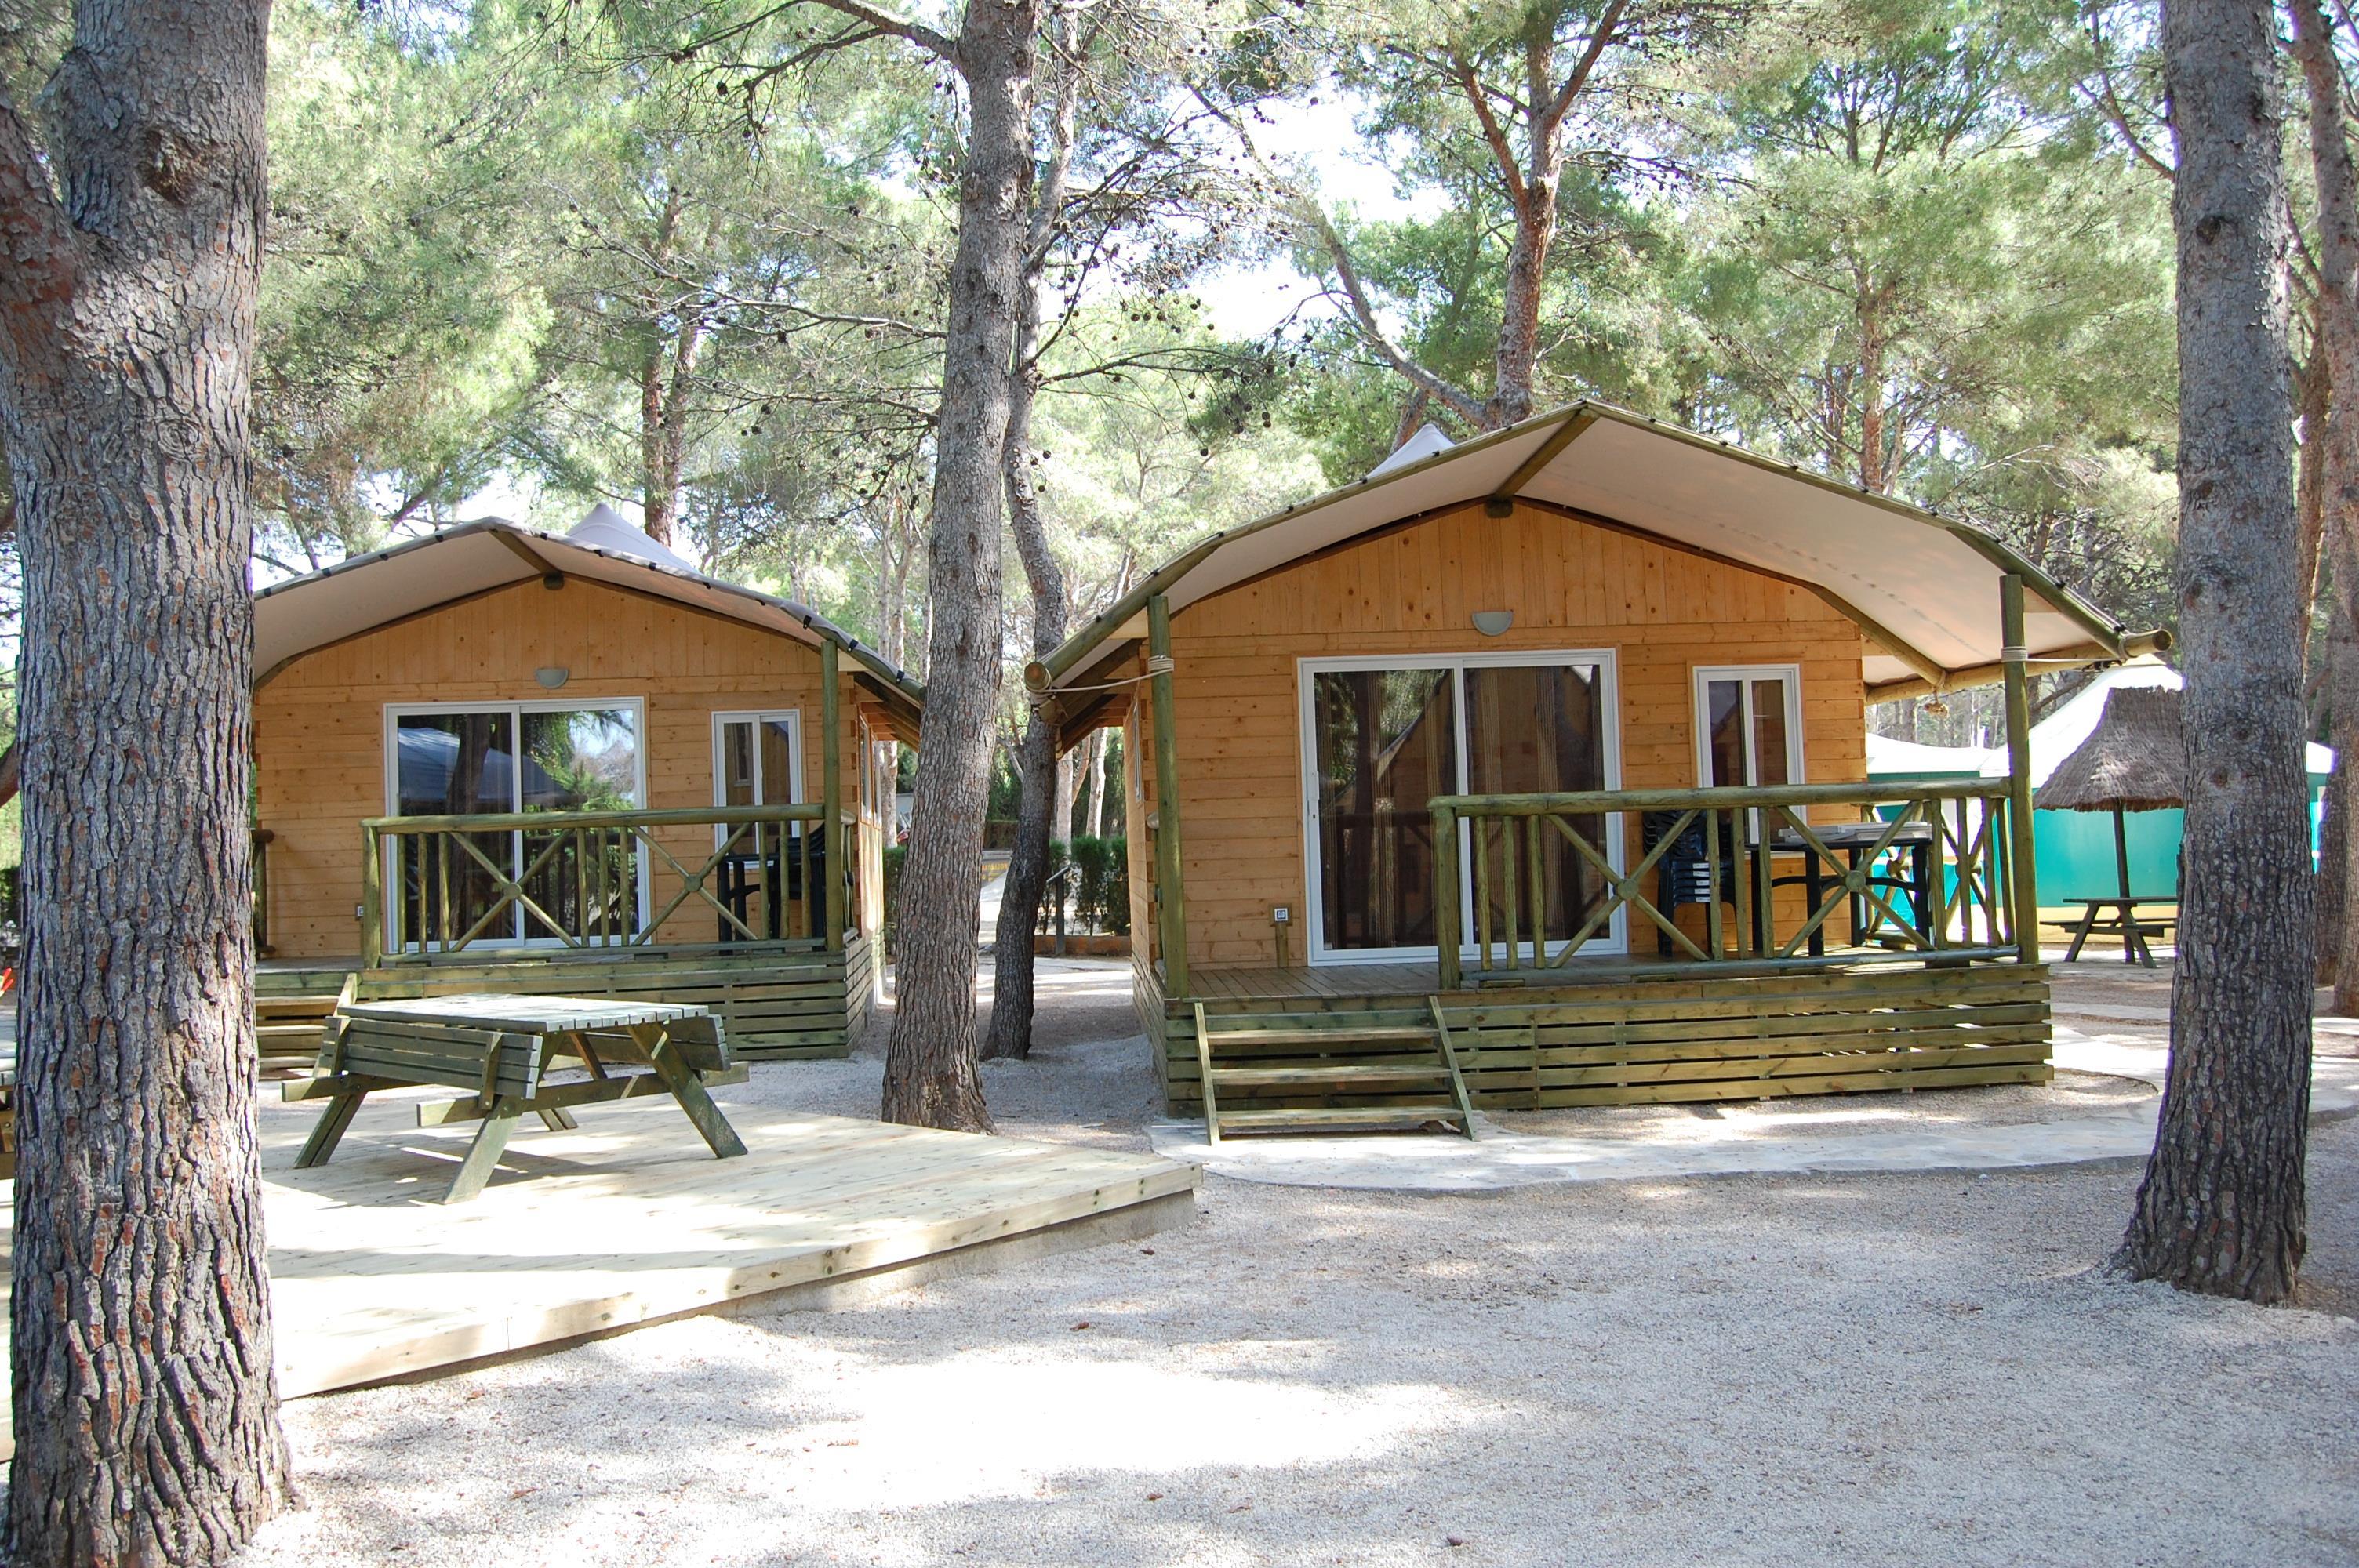 Lodge (2 bedrooms)